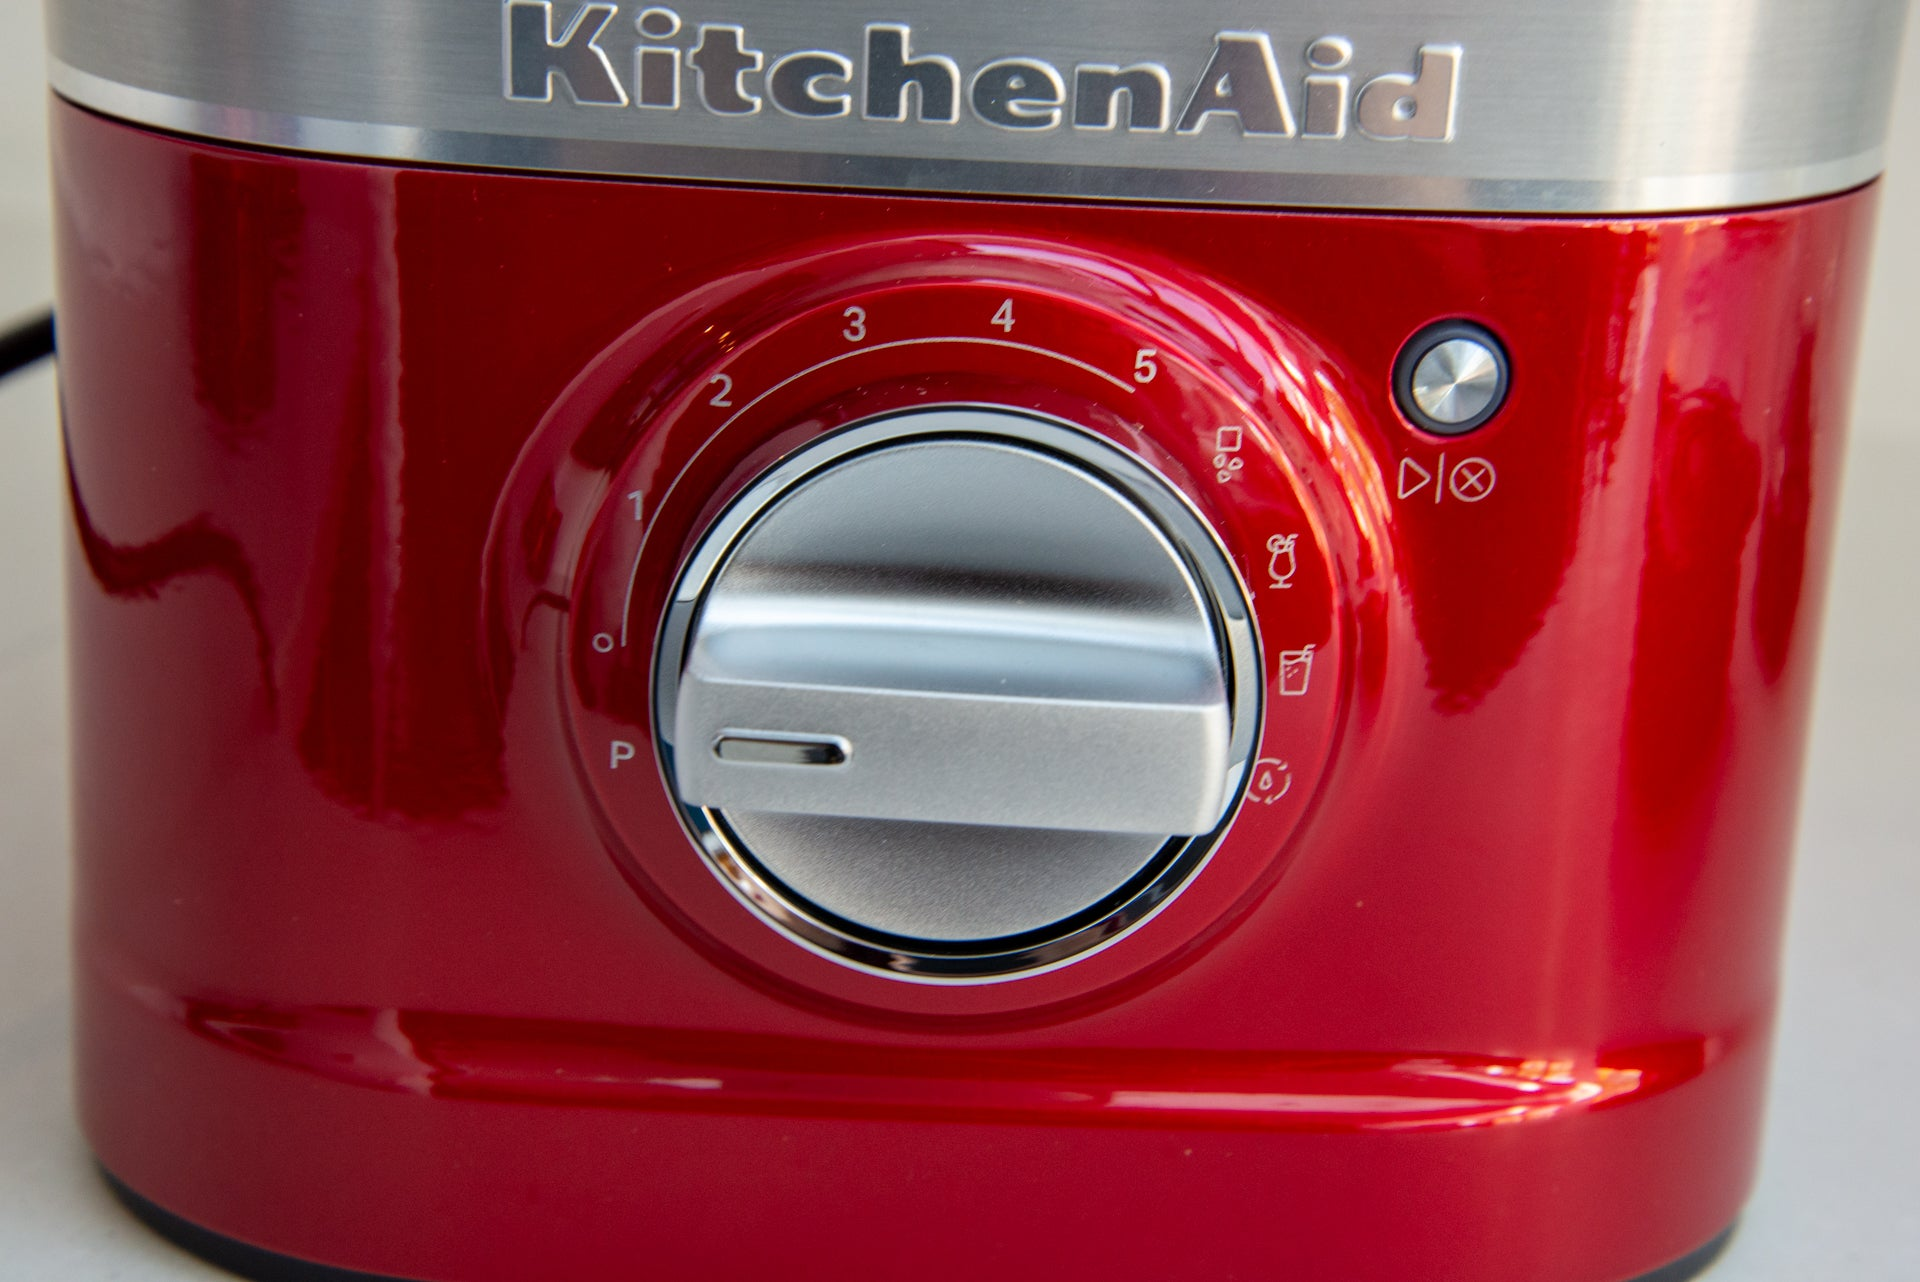 KitchenAid Artisan Blender K400 control dial